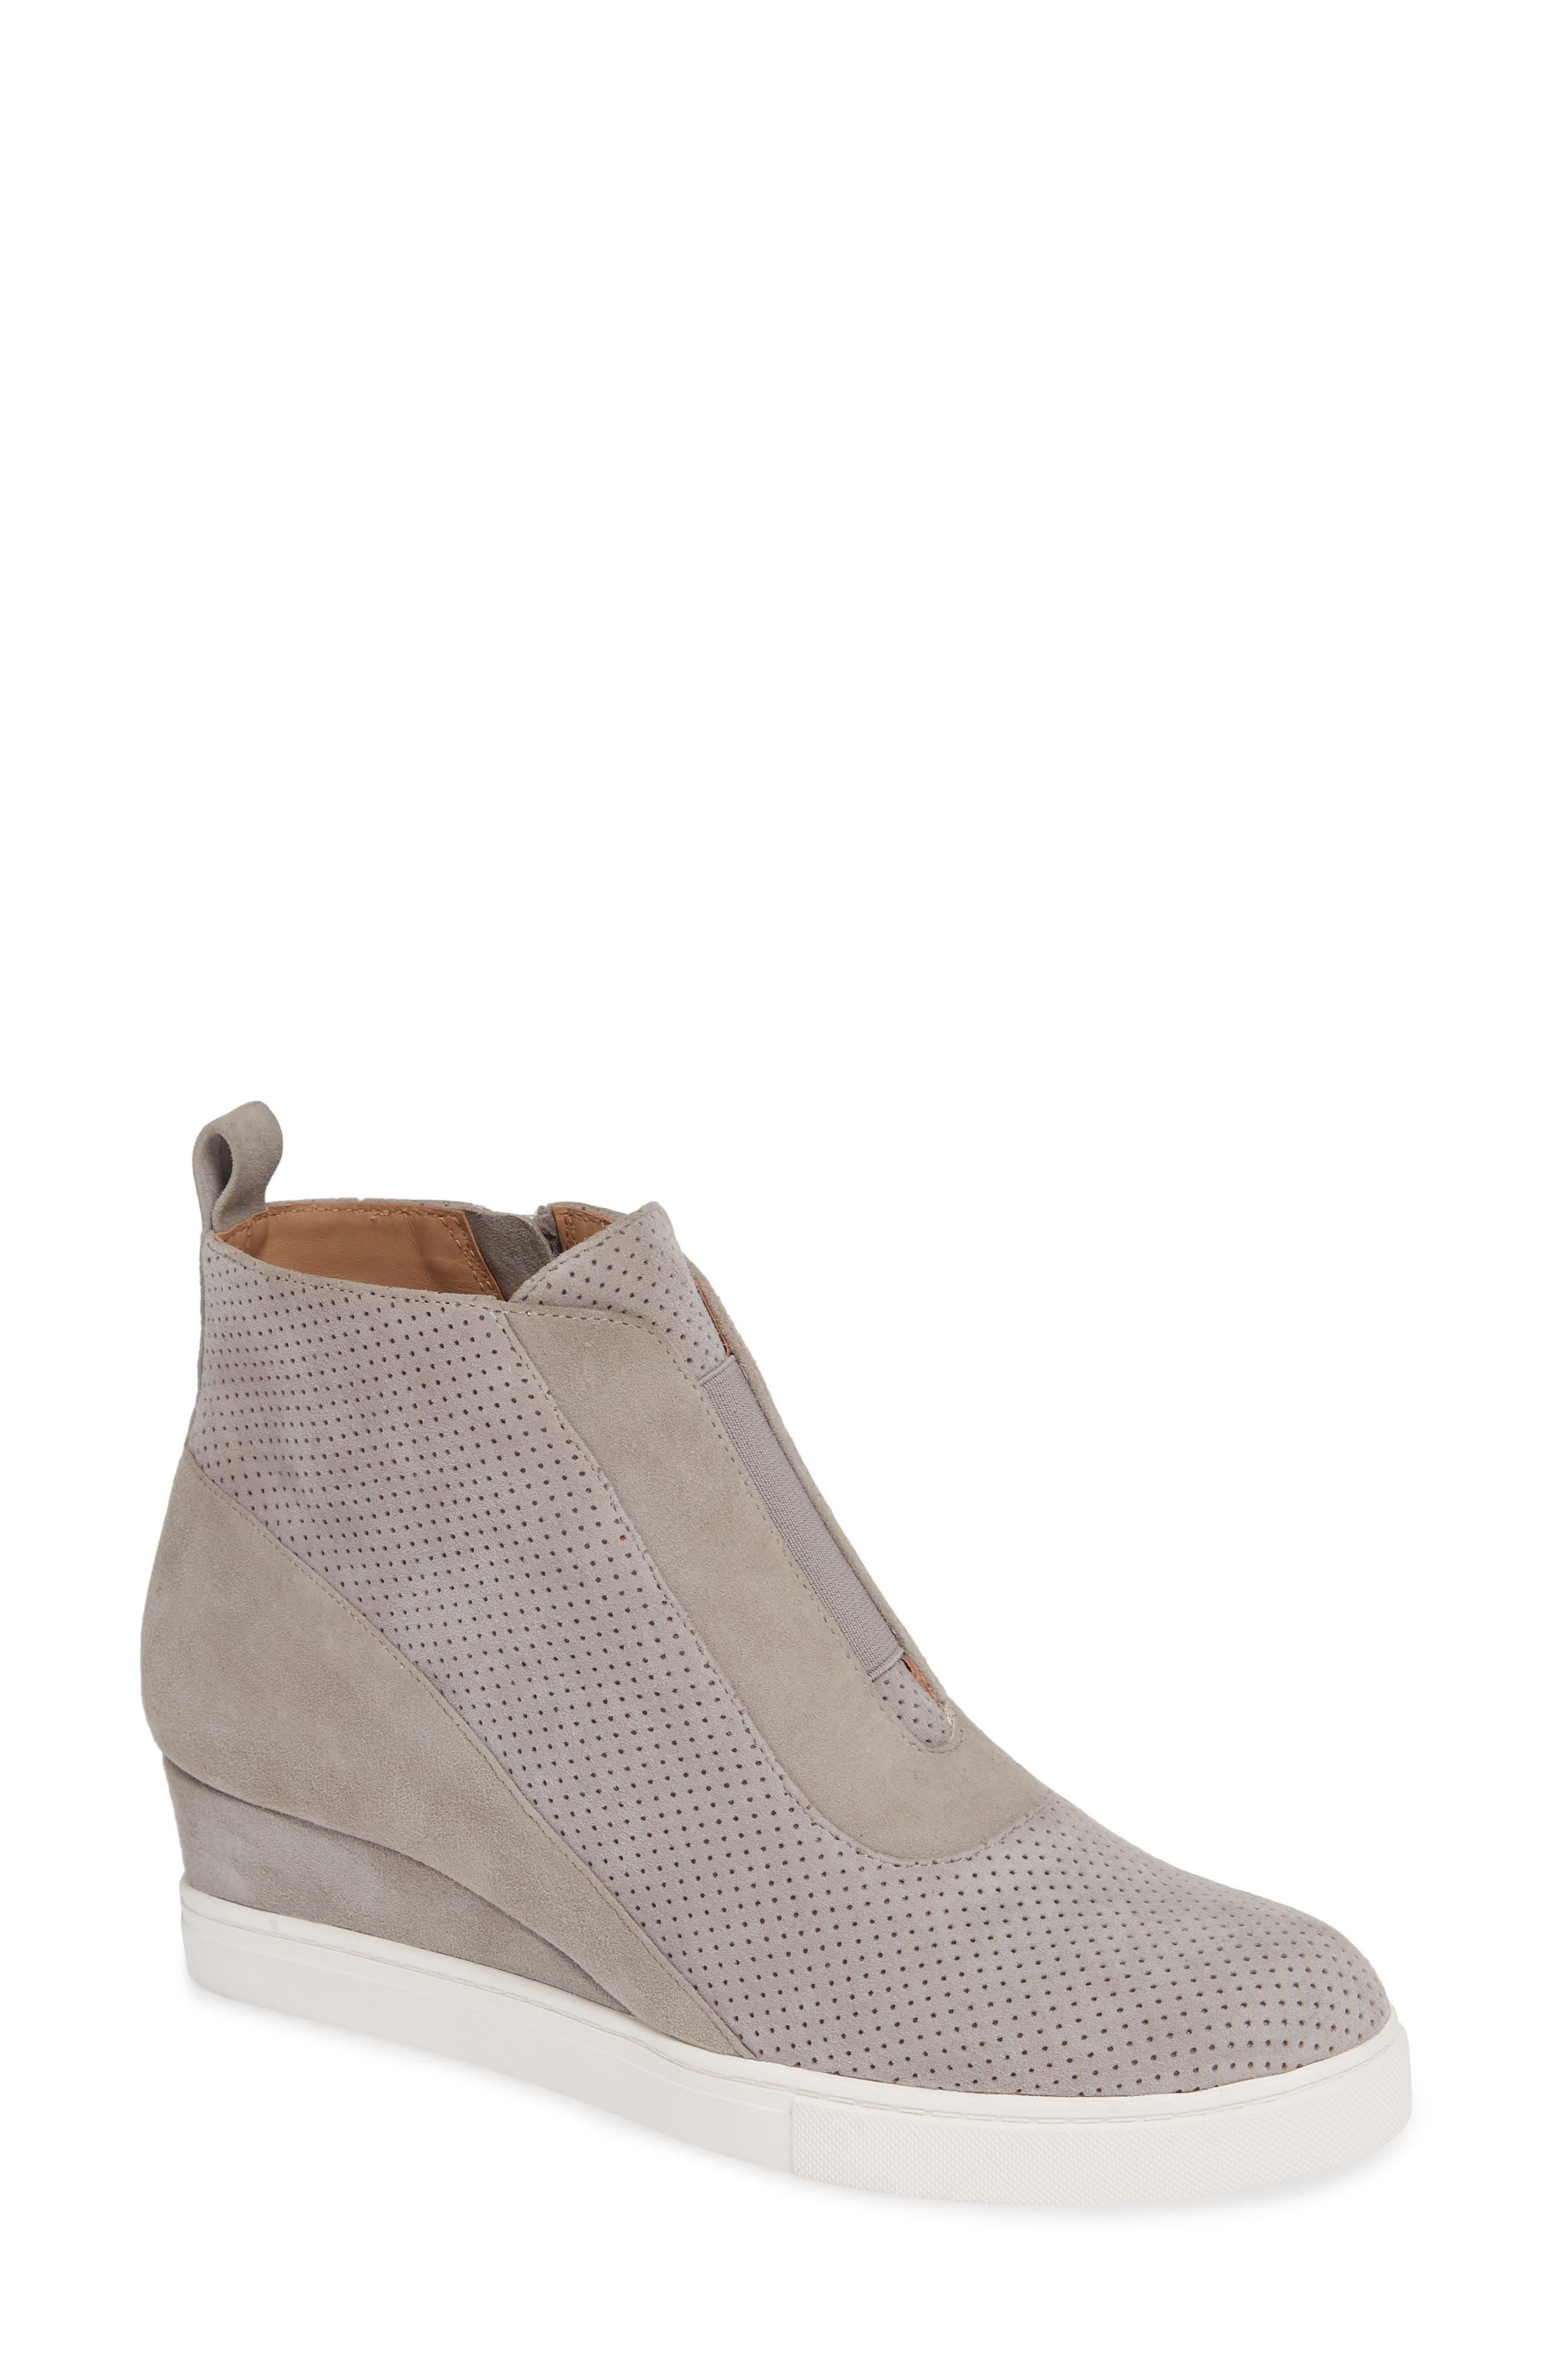 Donna Linea Paolo scarpe   Nordstrom Nordstrom Nordstrom 841eb7